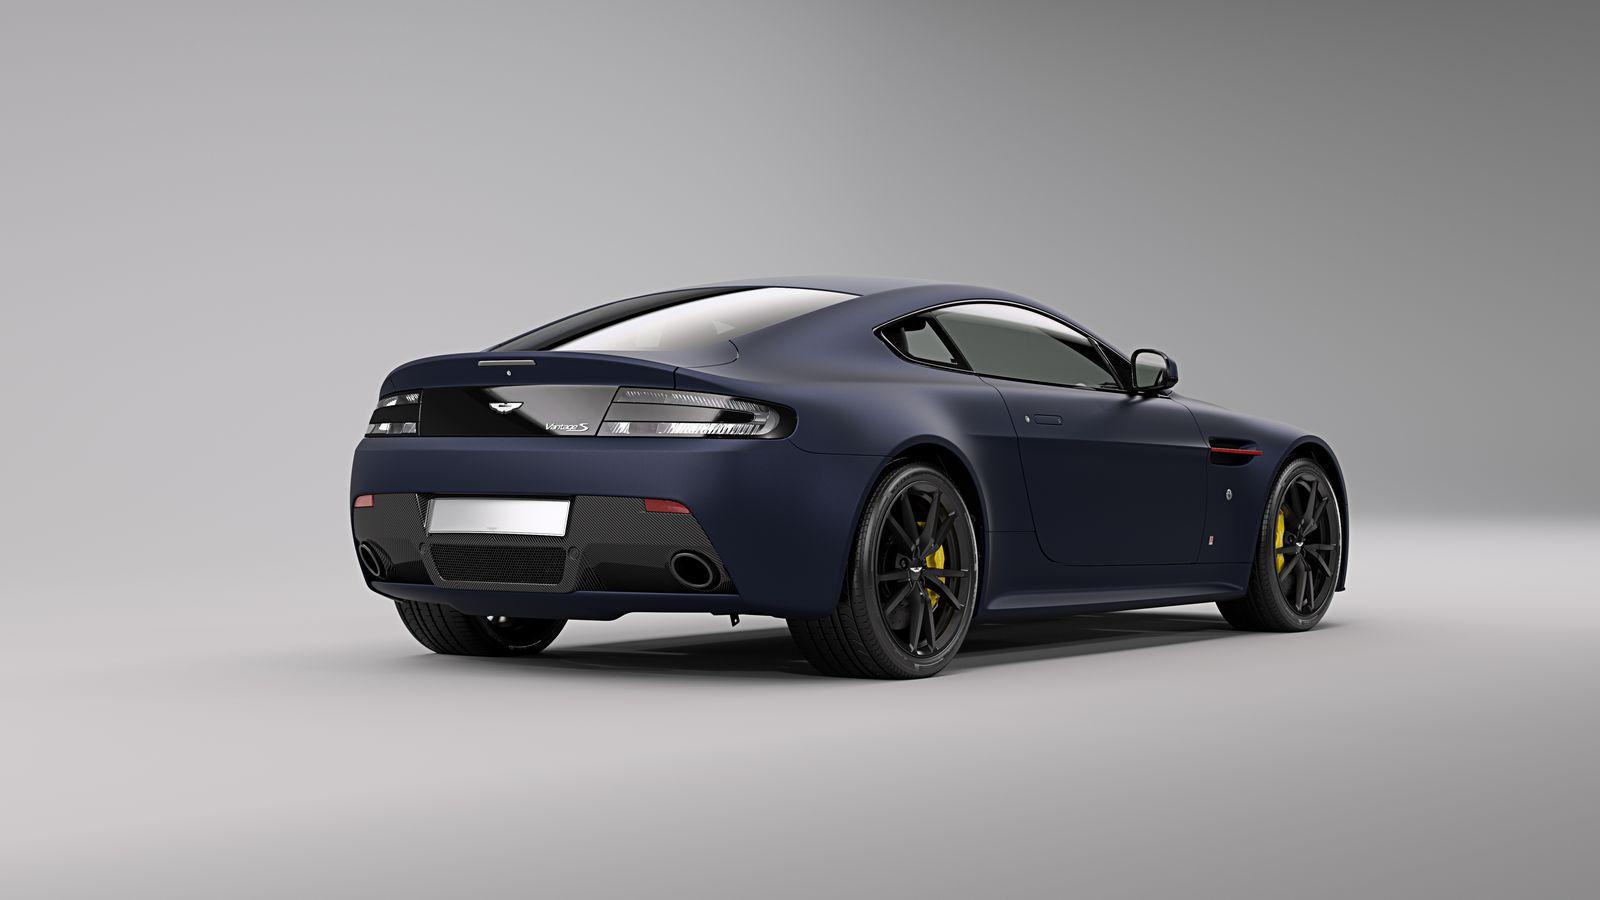 Aston Martin V8 and V12 Vantage Red Bull Racing Editions (5)